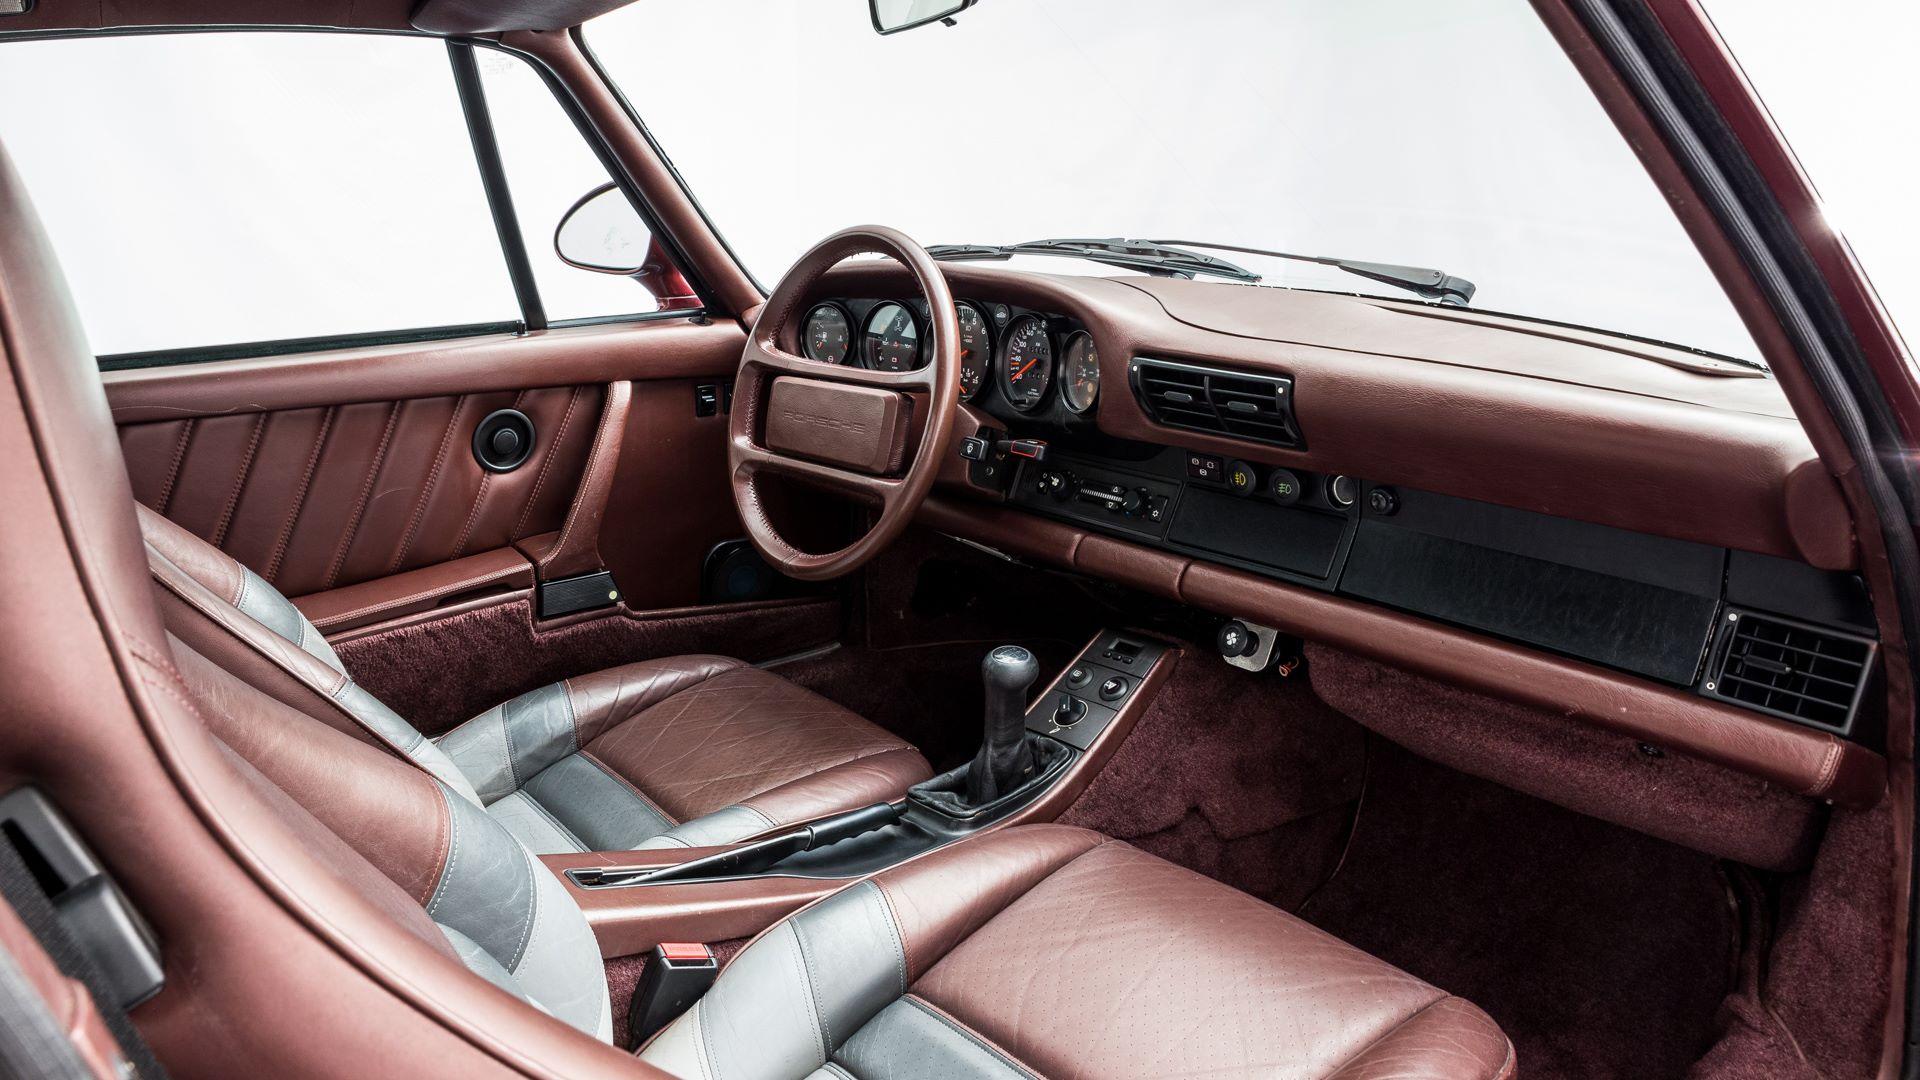 Porsche-959-Prototype-1985-for-sale-14